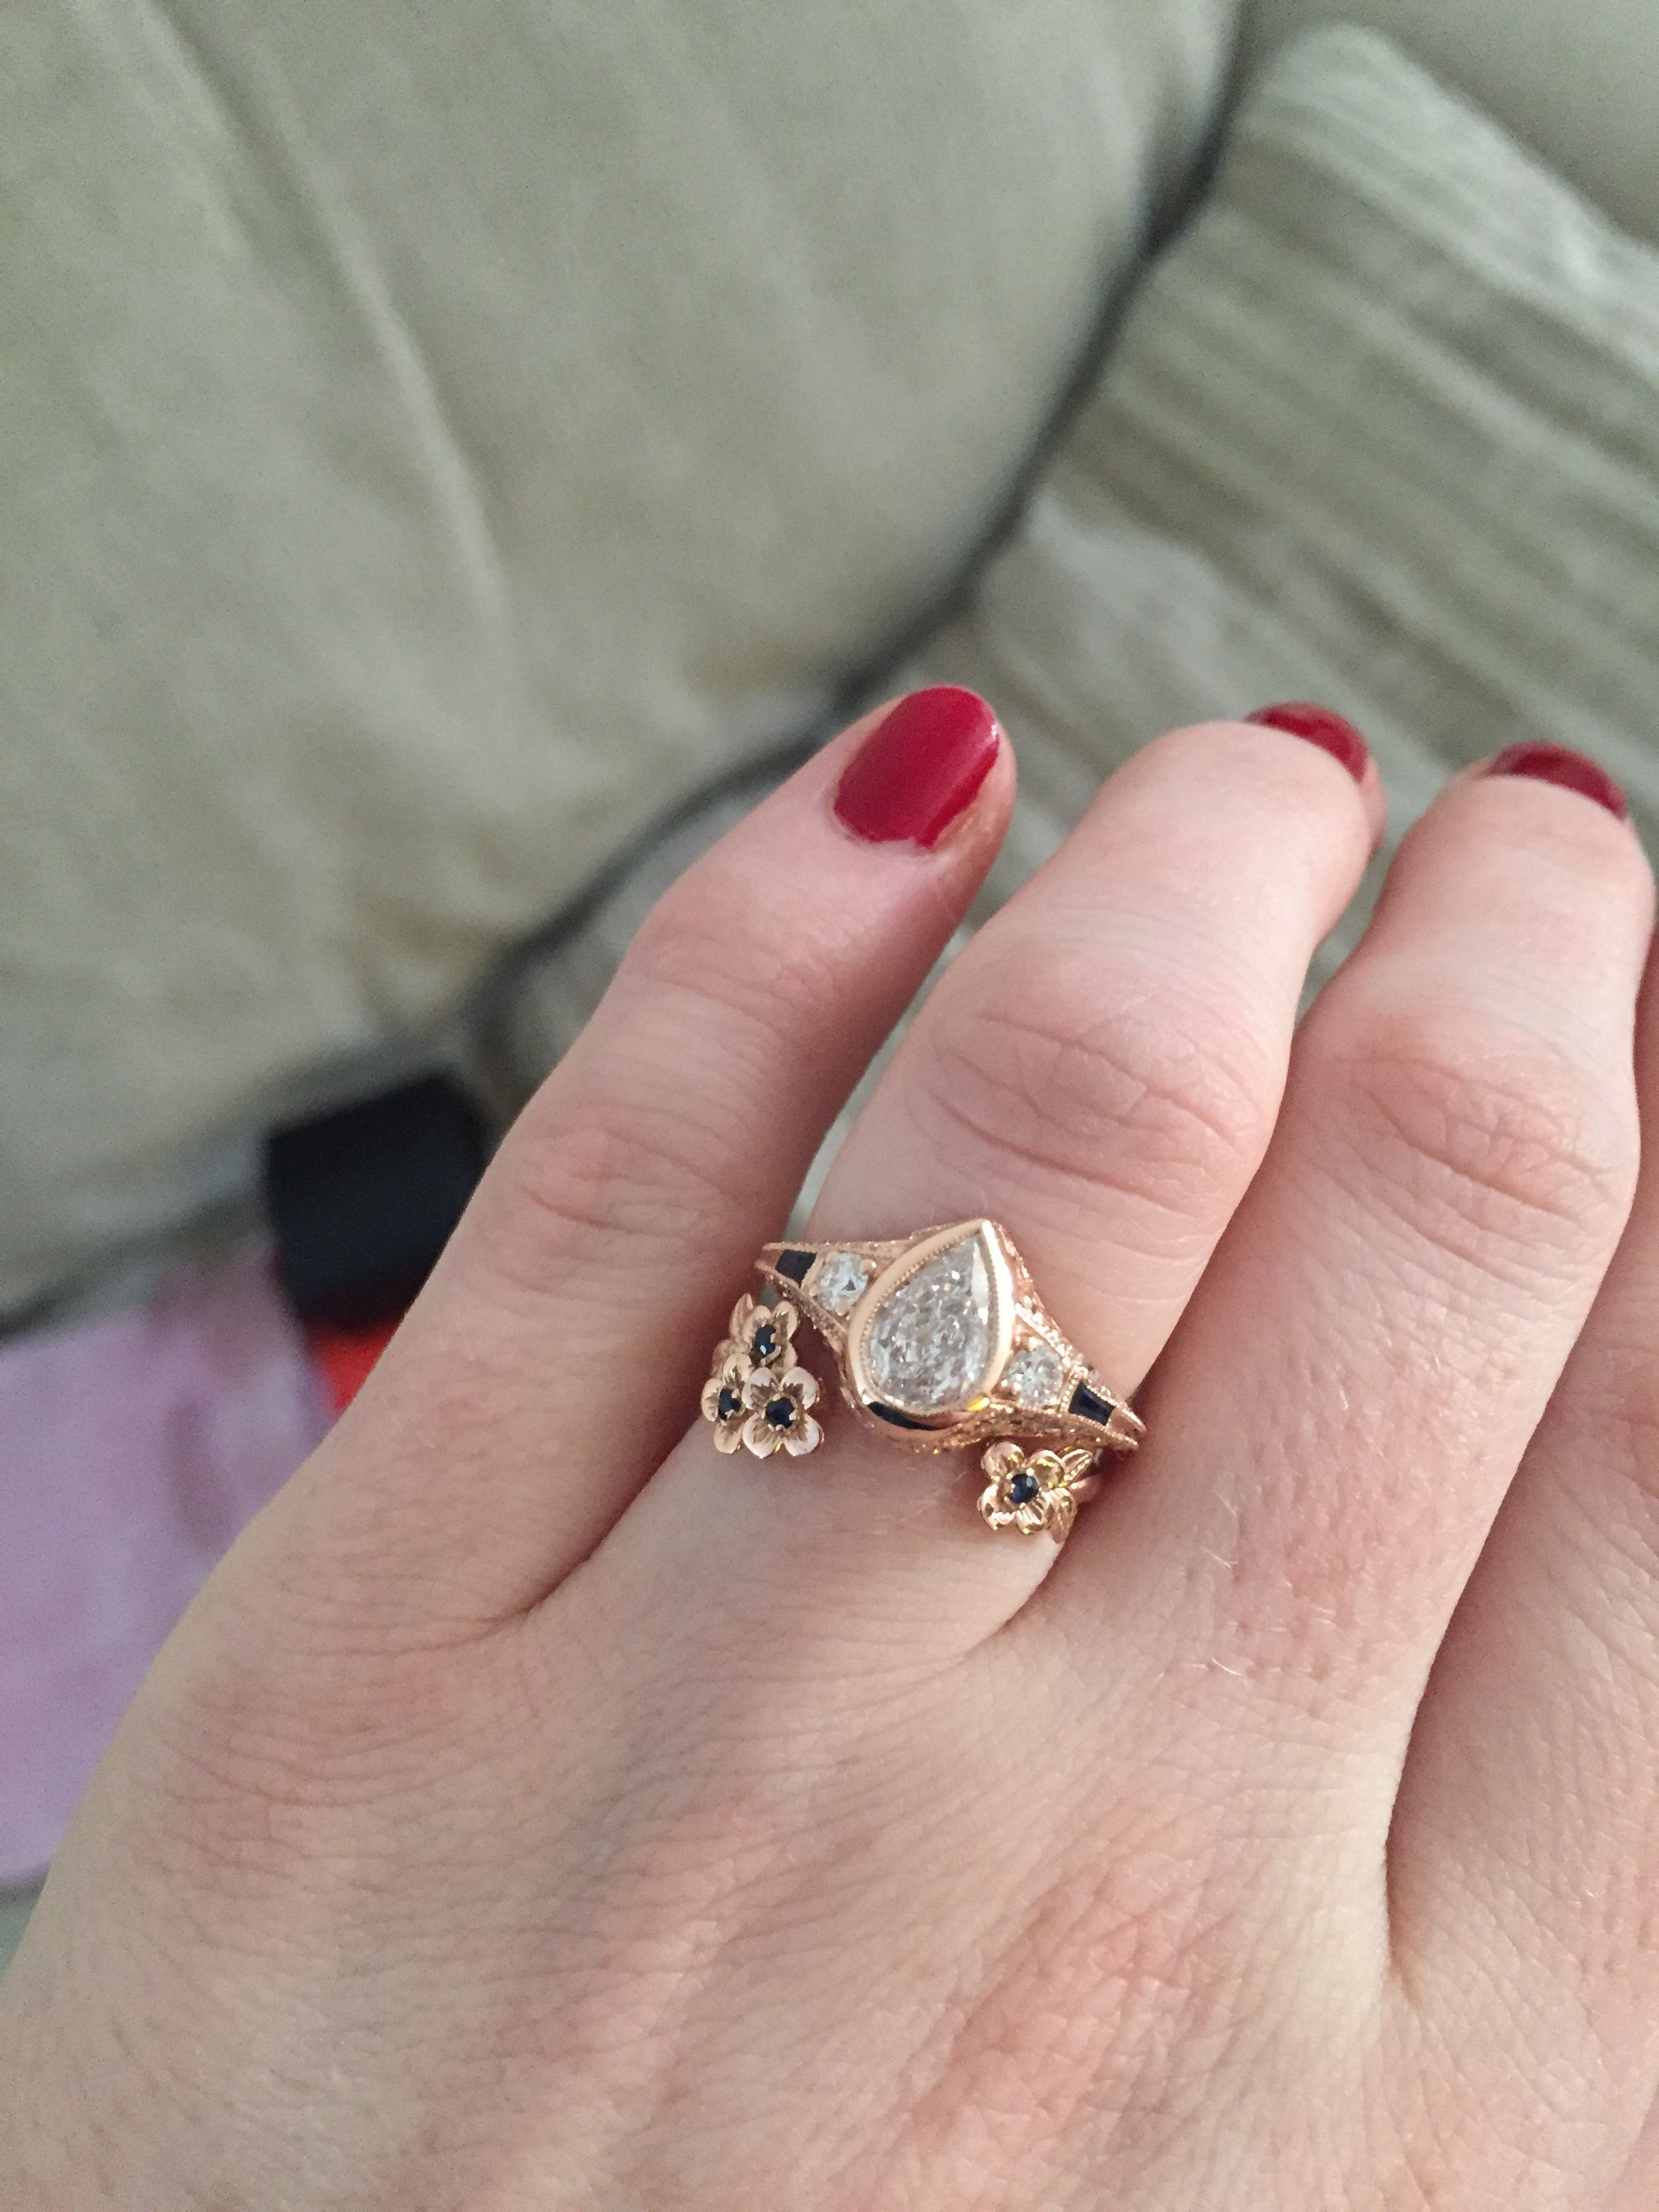 Please Show Me Your Pear E Rings Weddingbee Pear Diamond Rings Rings Pear Diamond